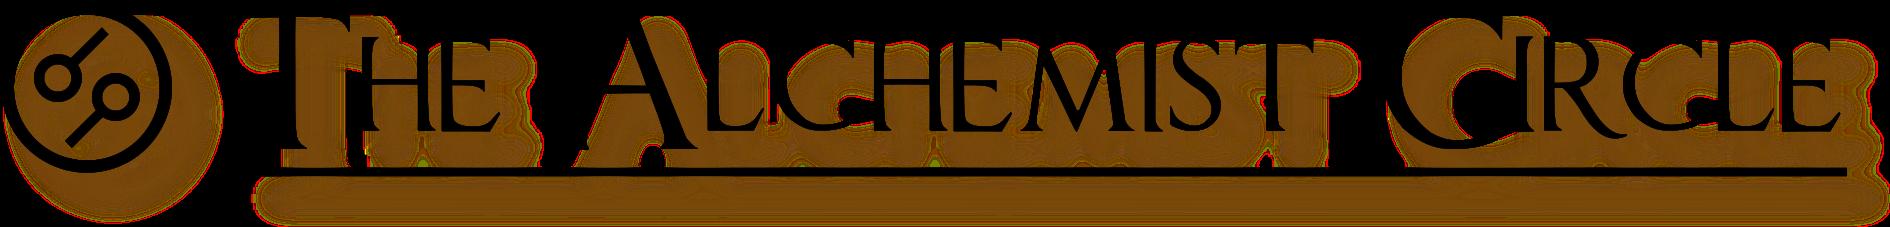 The Alchemist Circle